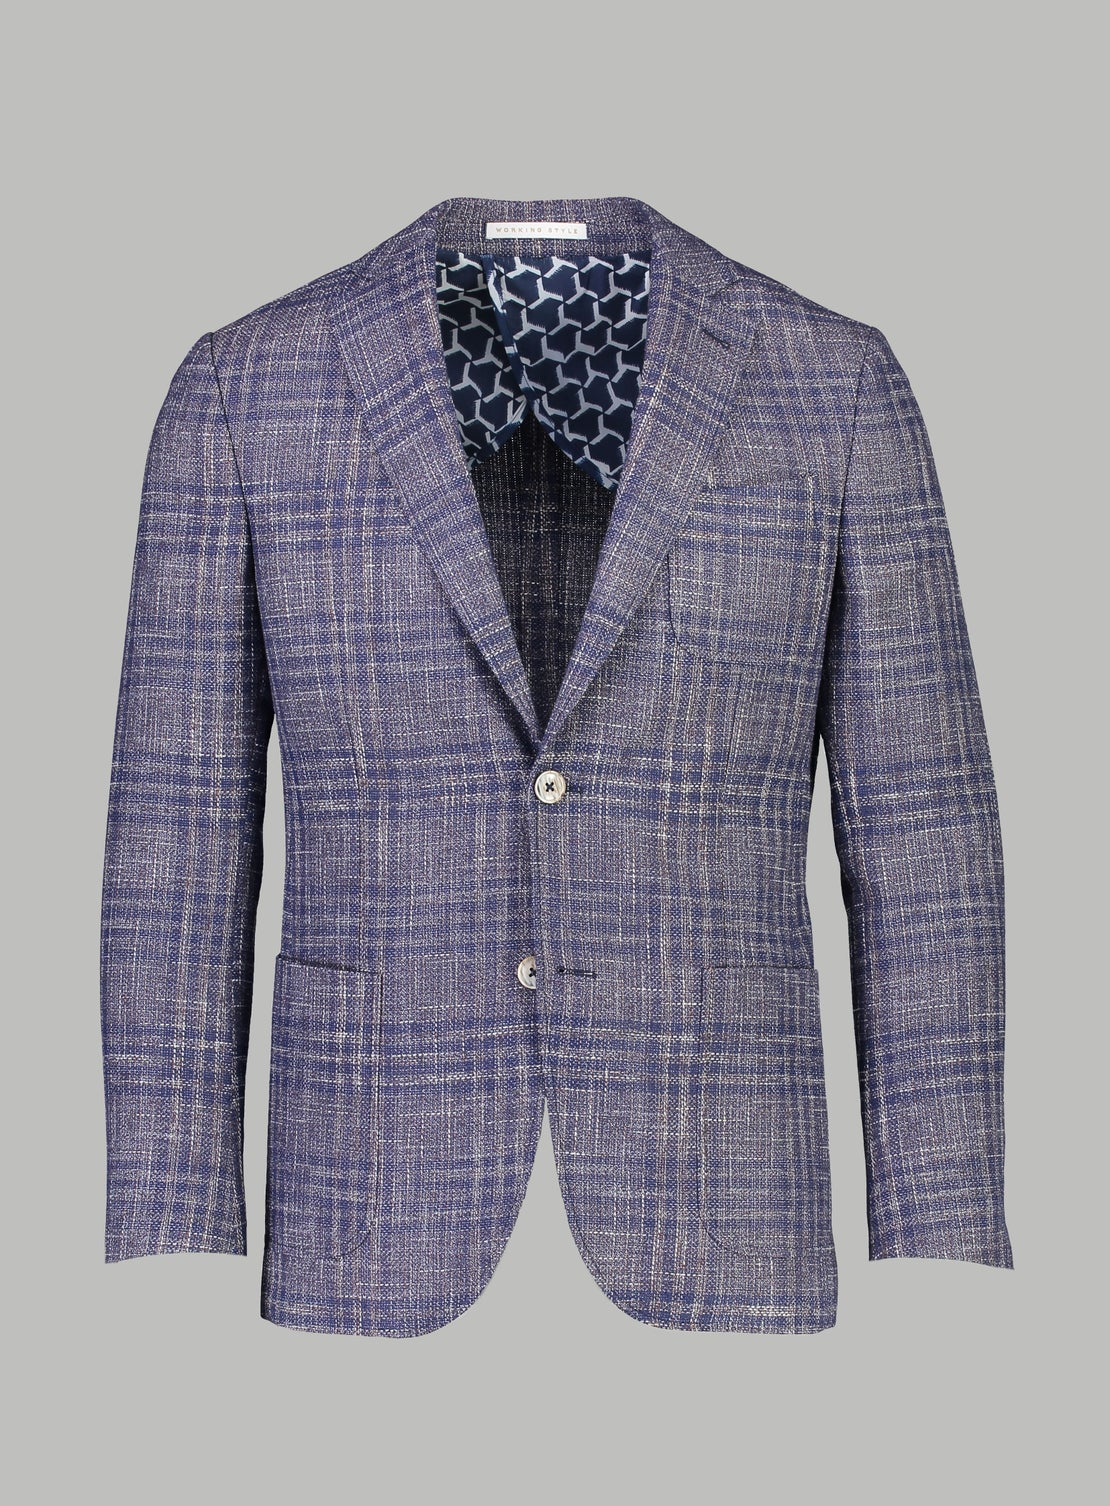 Dino Lavender Check Sportscoat